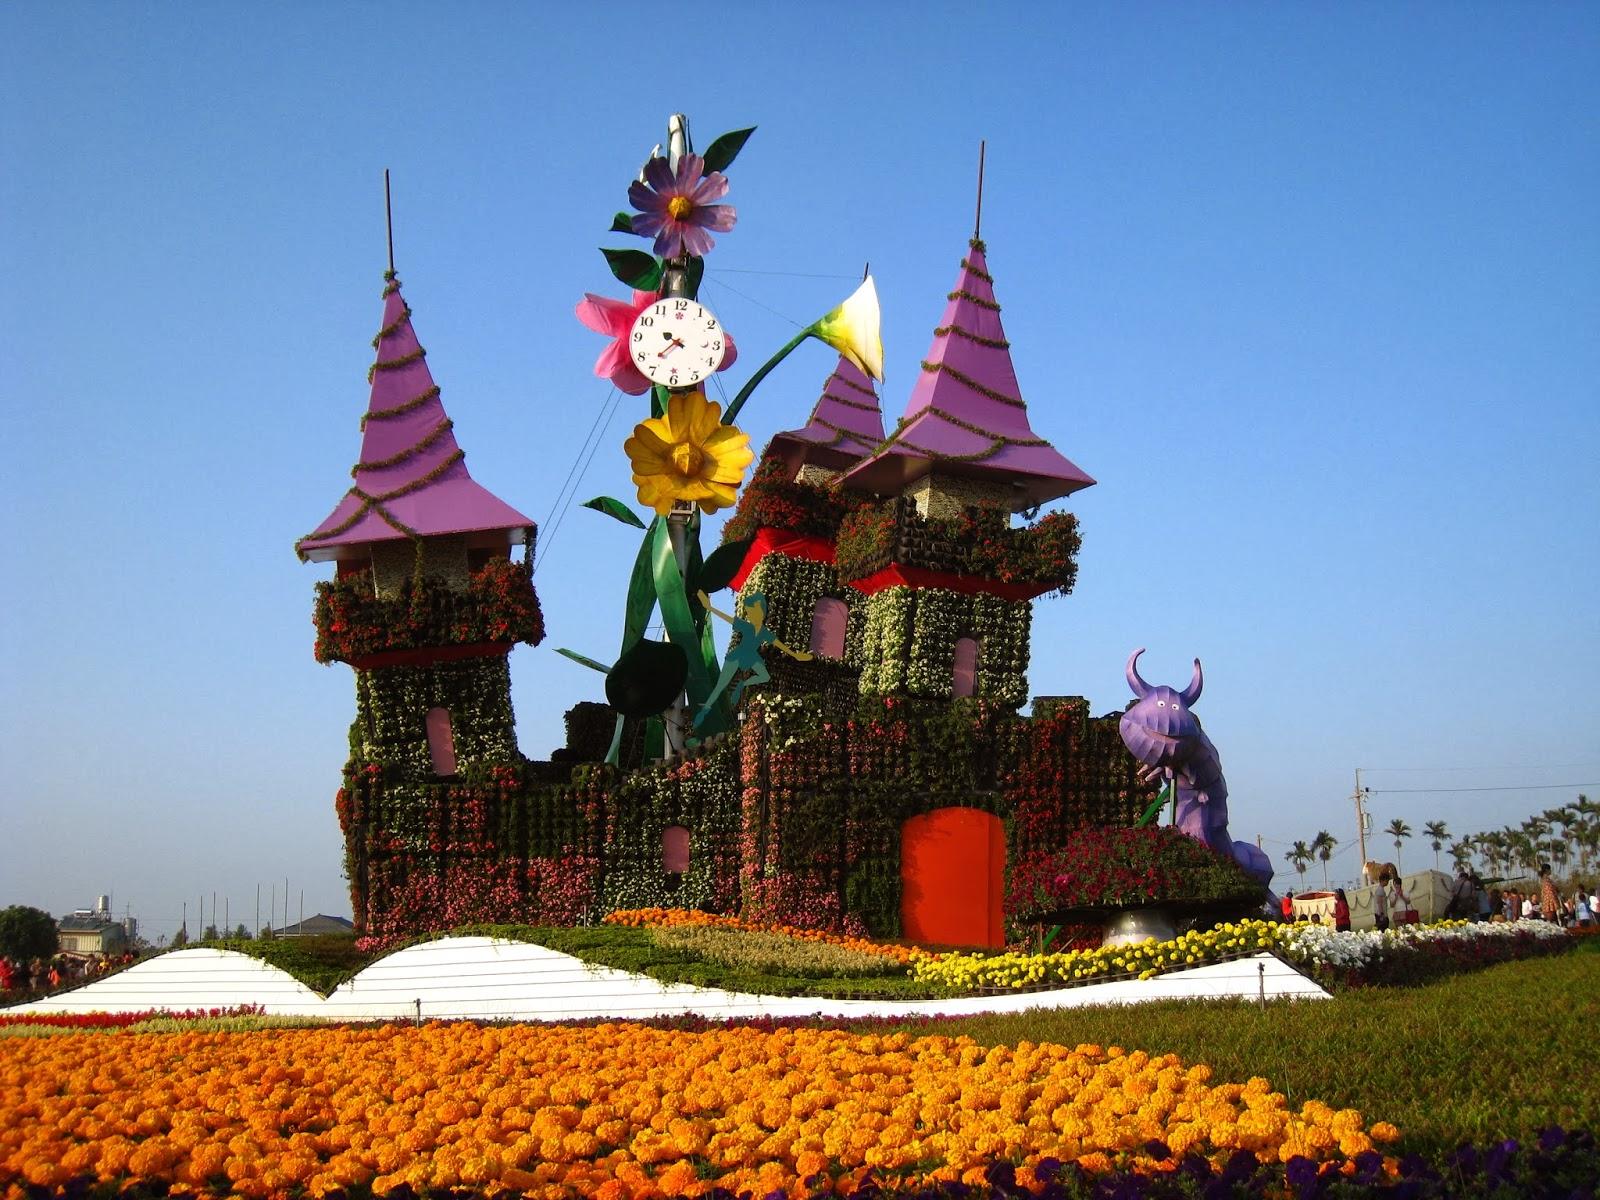 Paul's Trips 保羅嬉遊: 2013 新社花海 & 臺中國際花毯節 2013 Sea of Flower in Kinshe & Taichung International Flower Carpet Festival